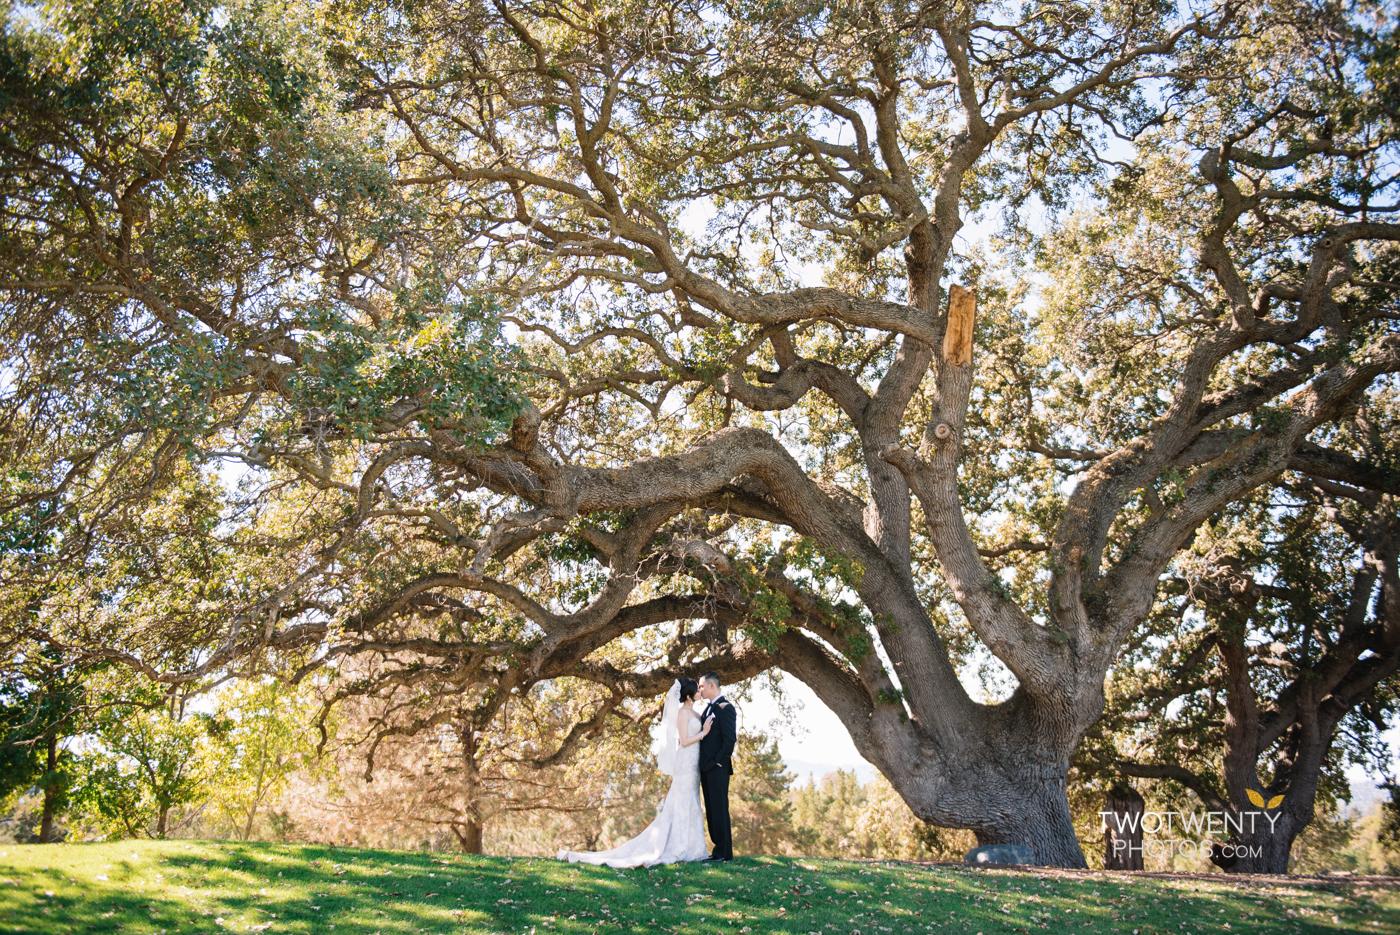 boundary-oaks-golf-course-wedding-walnut-grove-13